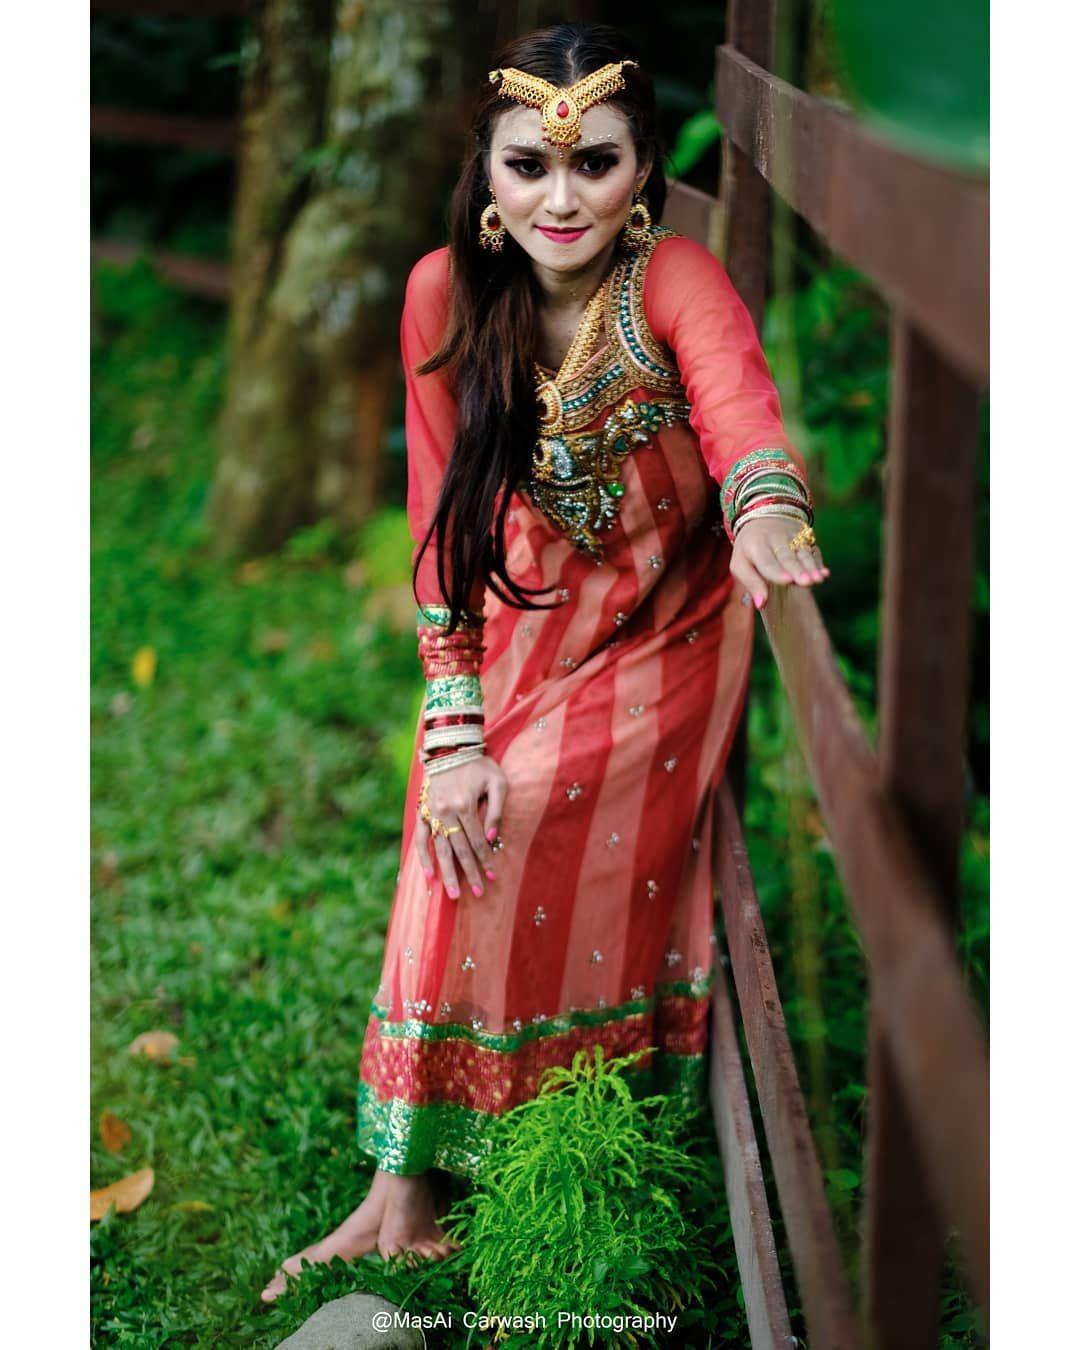 BEAUTY OF HINDUSTAN....BEAUTY OF HINDUSTAN.  (Moment puri mataram art photography)  Model.@resty_ramadhani_.  Mua.@rity_doyle  Location.@puri_mataram .  #fujifilmxt3 #fujifilmxt2#terfujilah #fashionforward #fashionphotographer #fashionmodel #fashiondaily #fashiongirl #fashionphotography #fashioninspiration #fashioneditorial #fashionshoot #nikon #artistic_greece #portraitmood #sombrebeings #potrait #portraits_ig #photography #portrait_shots #portraiture #potraiture #canon #instamood #instafol